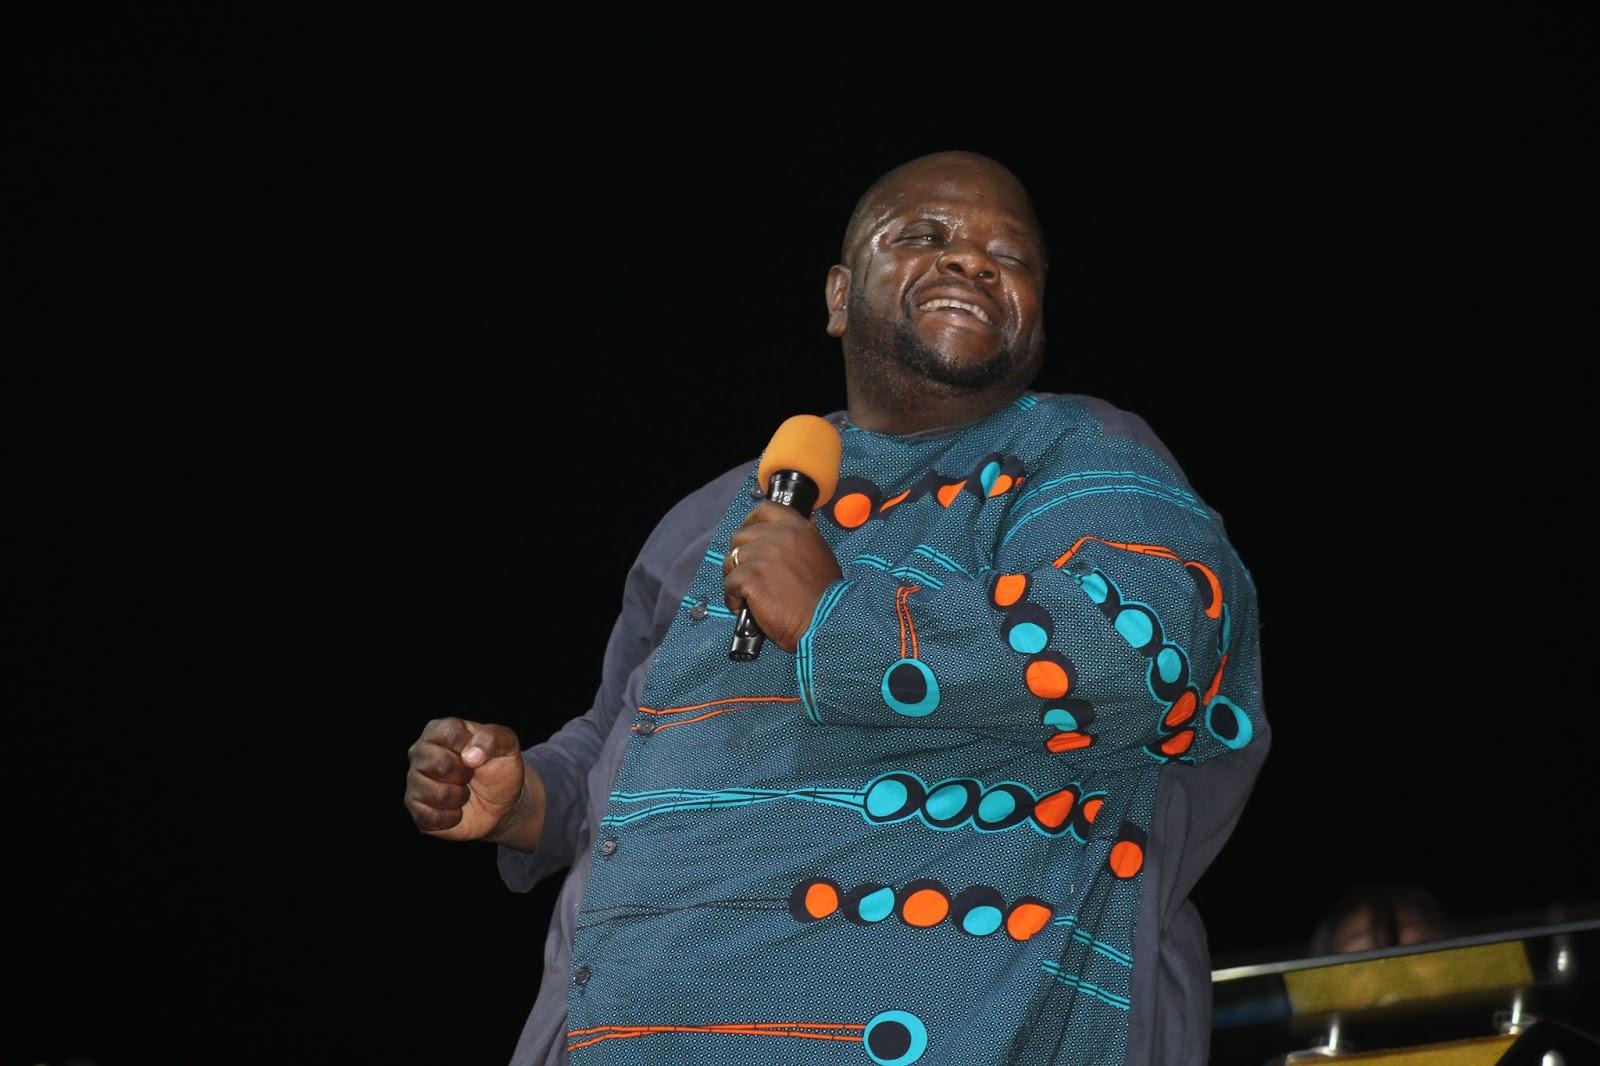 Pastor G (real name Stanley Gwanzura)